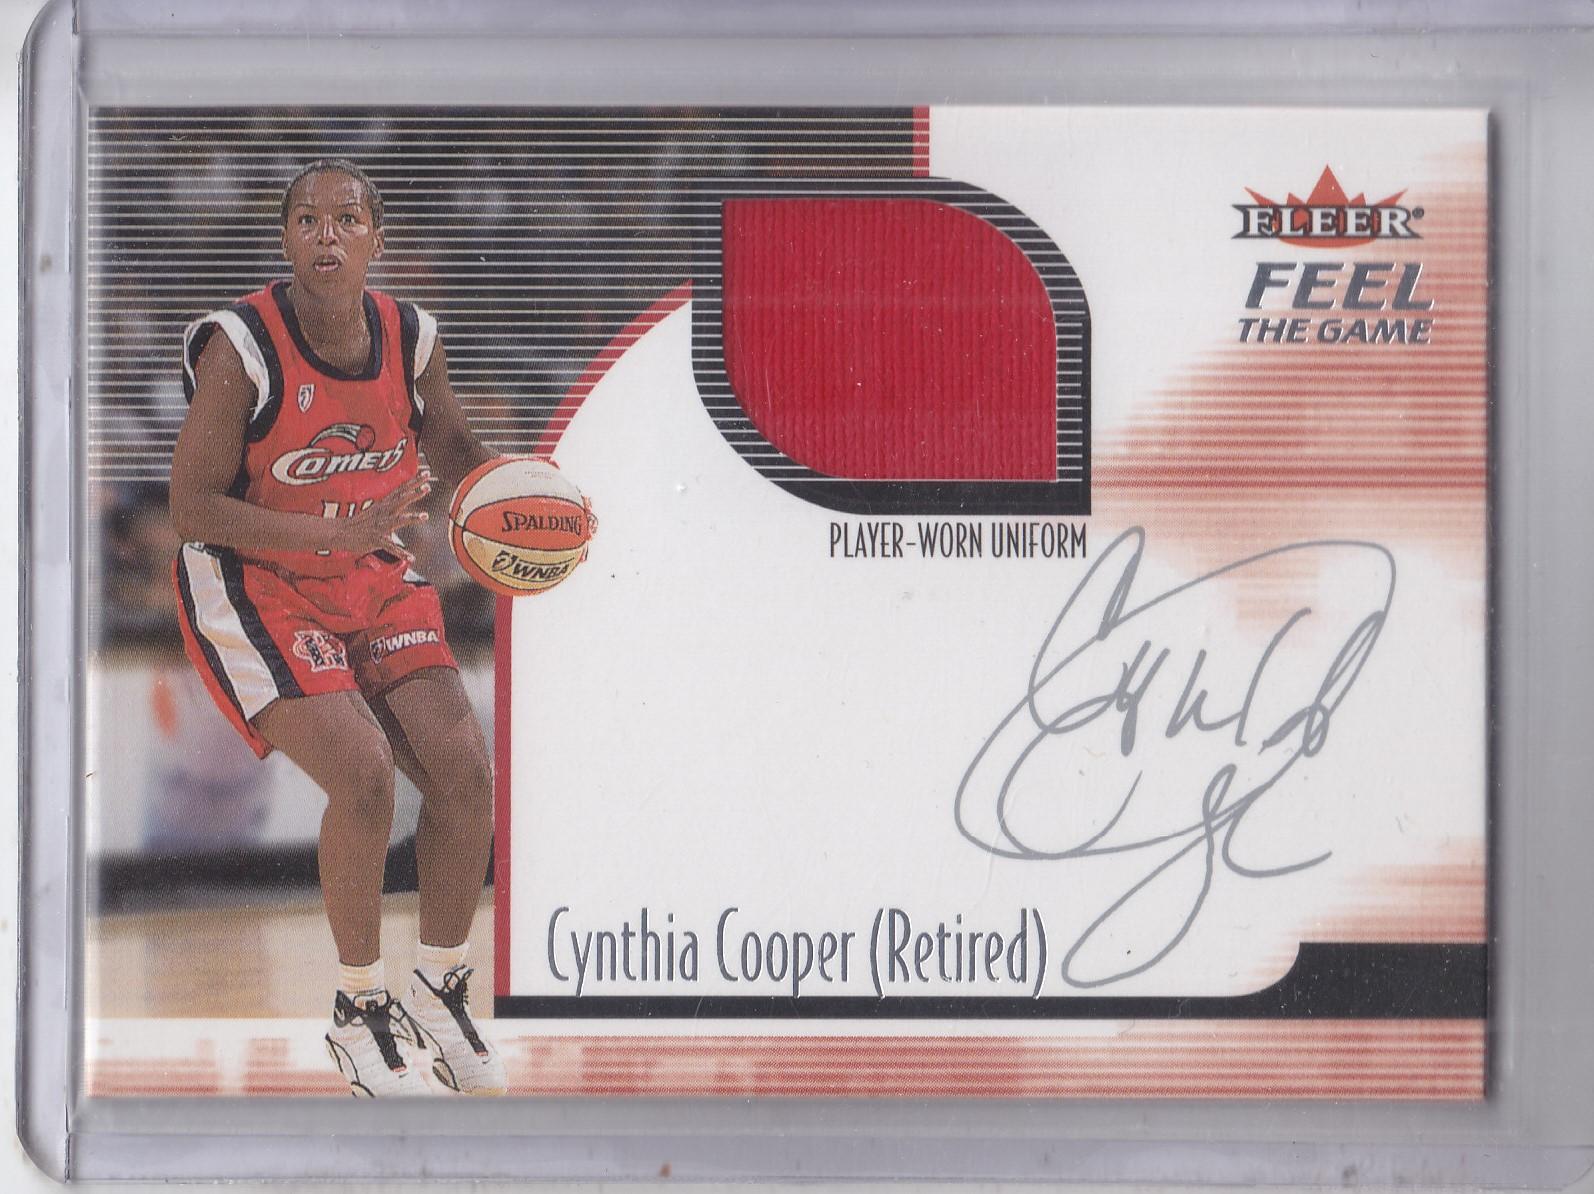 2001 Ultra WNBA Feel the Game #2 Cynthia Cooper